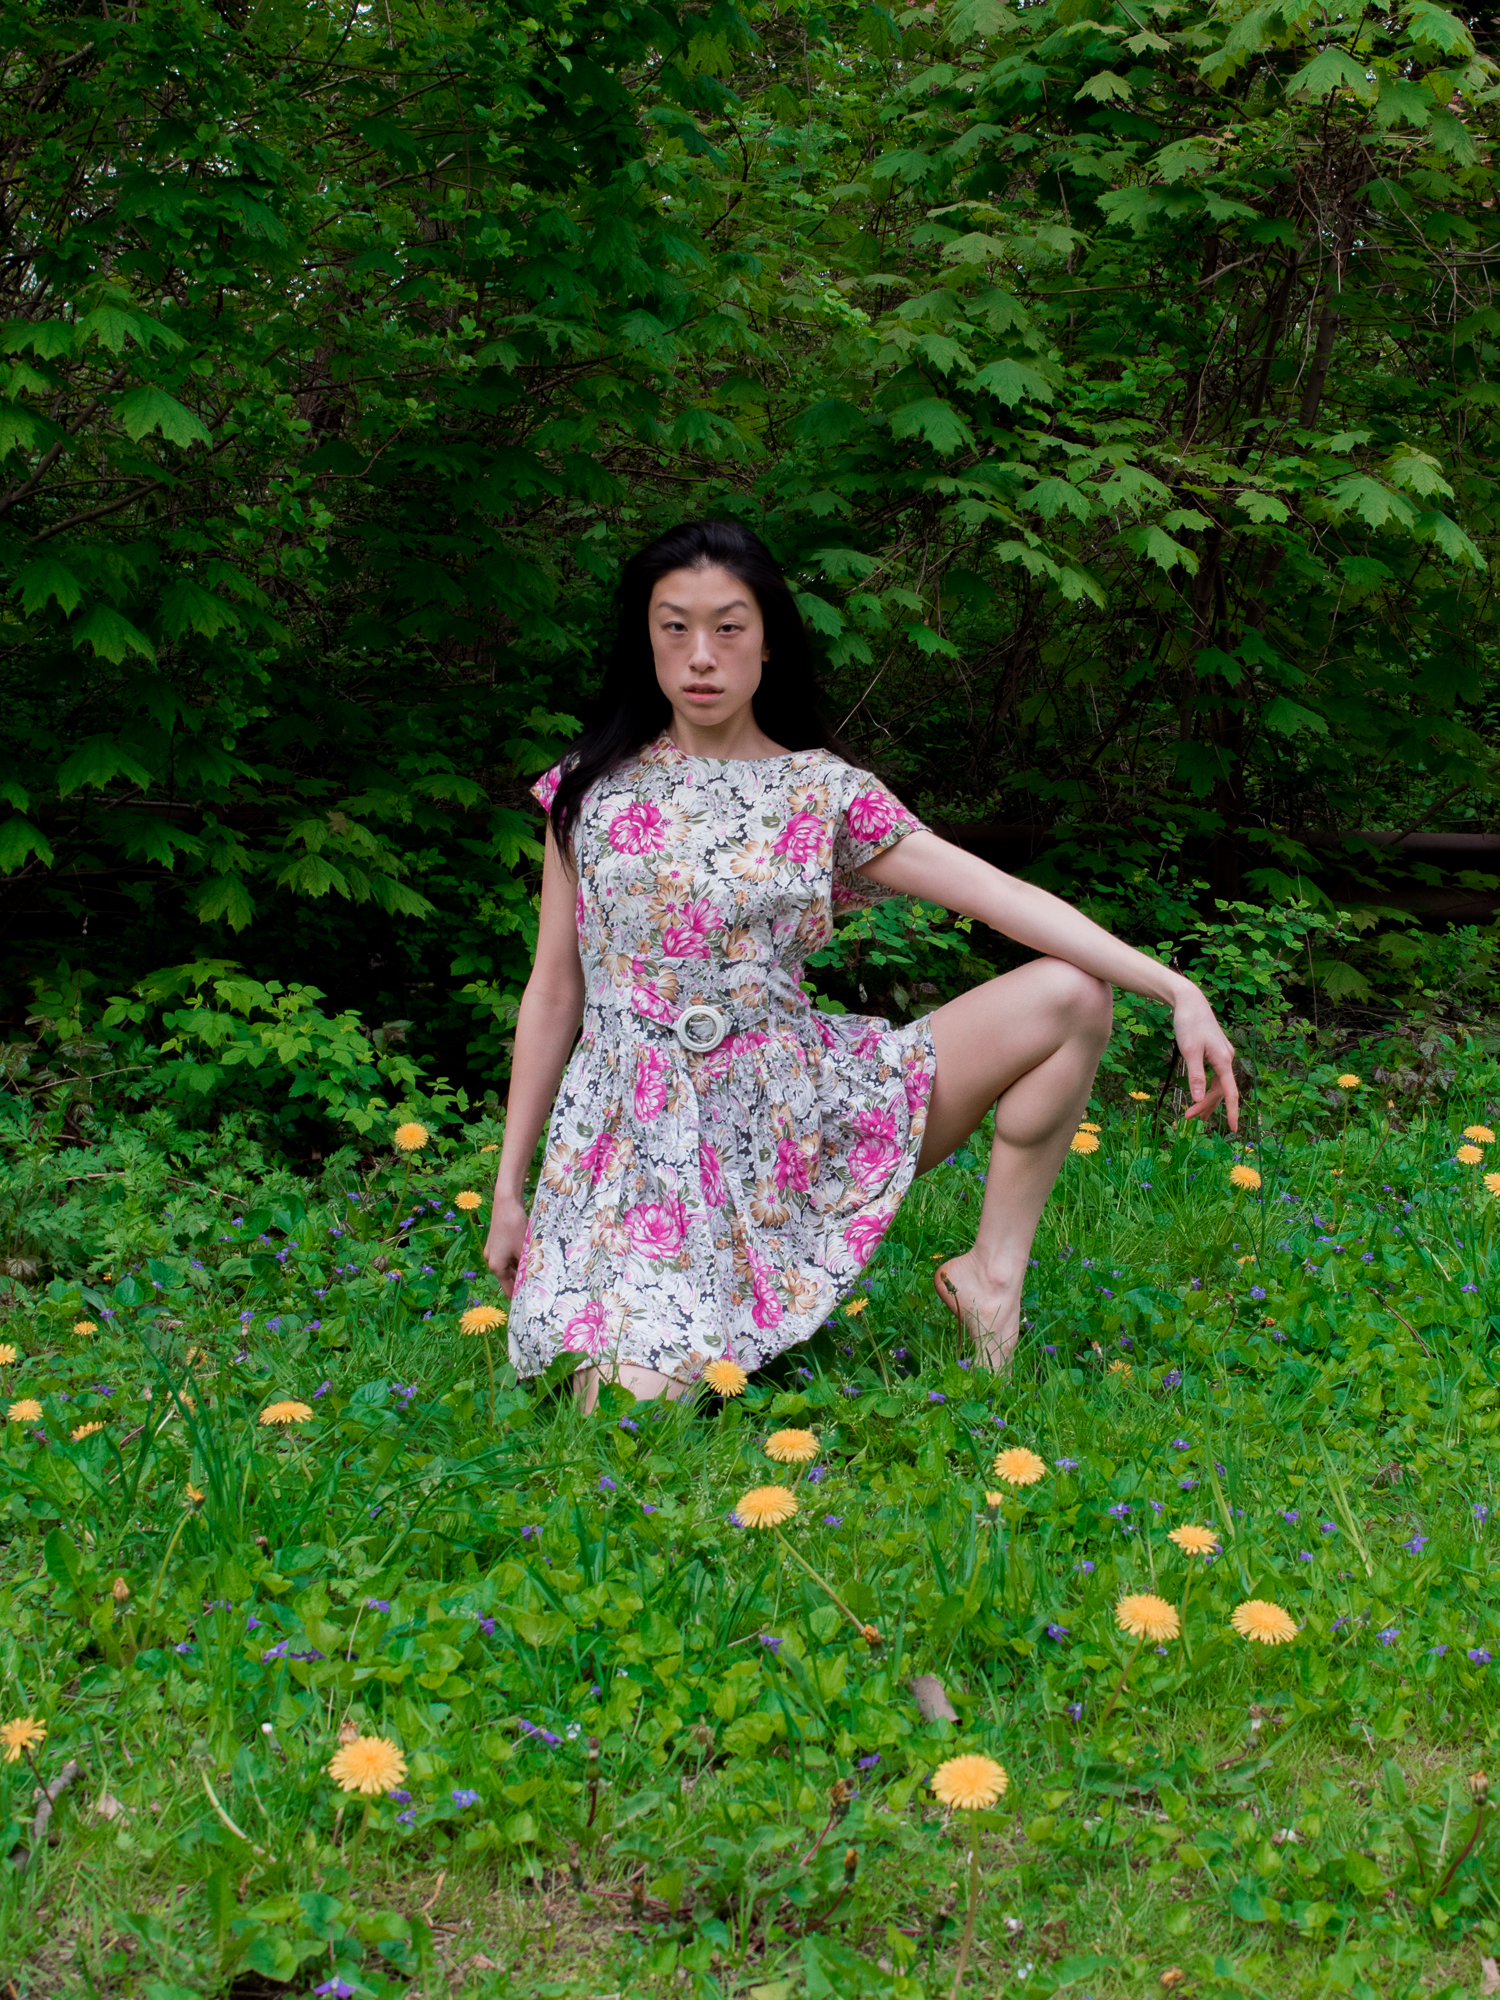 Female east asian blogger in pink, 1950s floral vintage dress